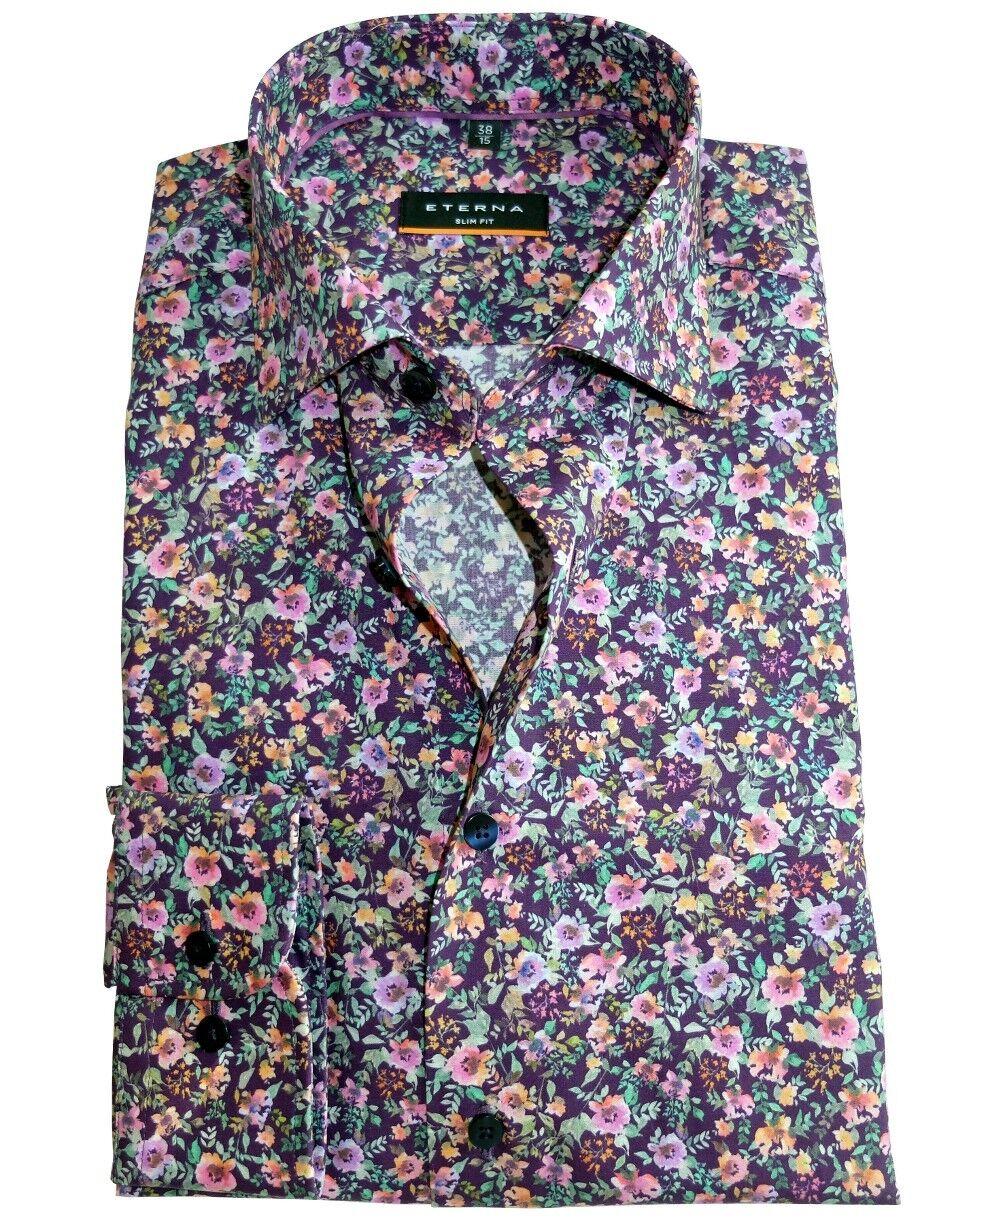 Eterna Slim Fit Langarmhemd purple mit buntem Floraldessin ÄL 67cm Gr. 39 bis 44